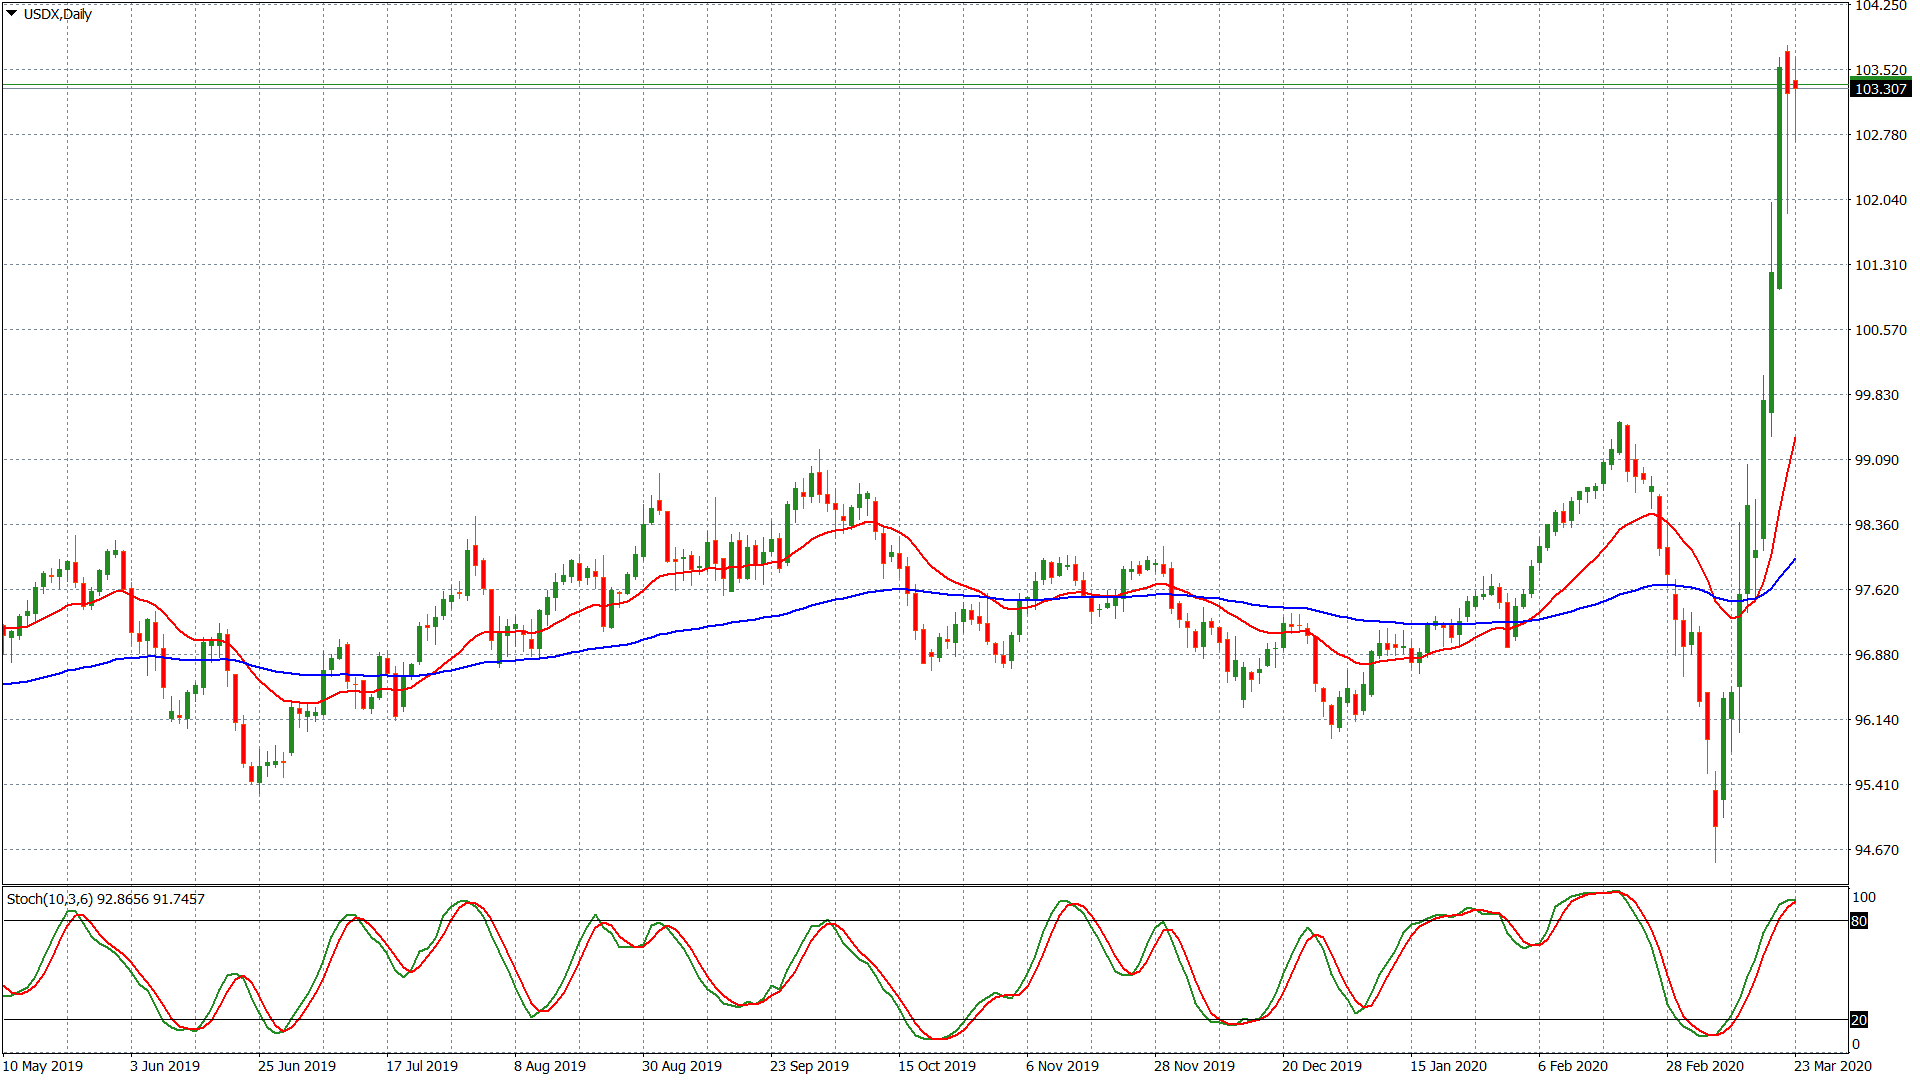 Dollar Index - grafico giornaliero